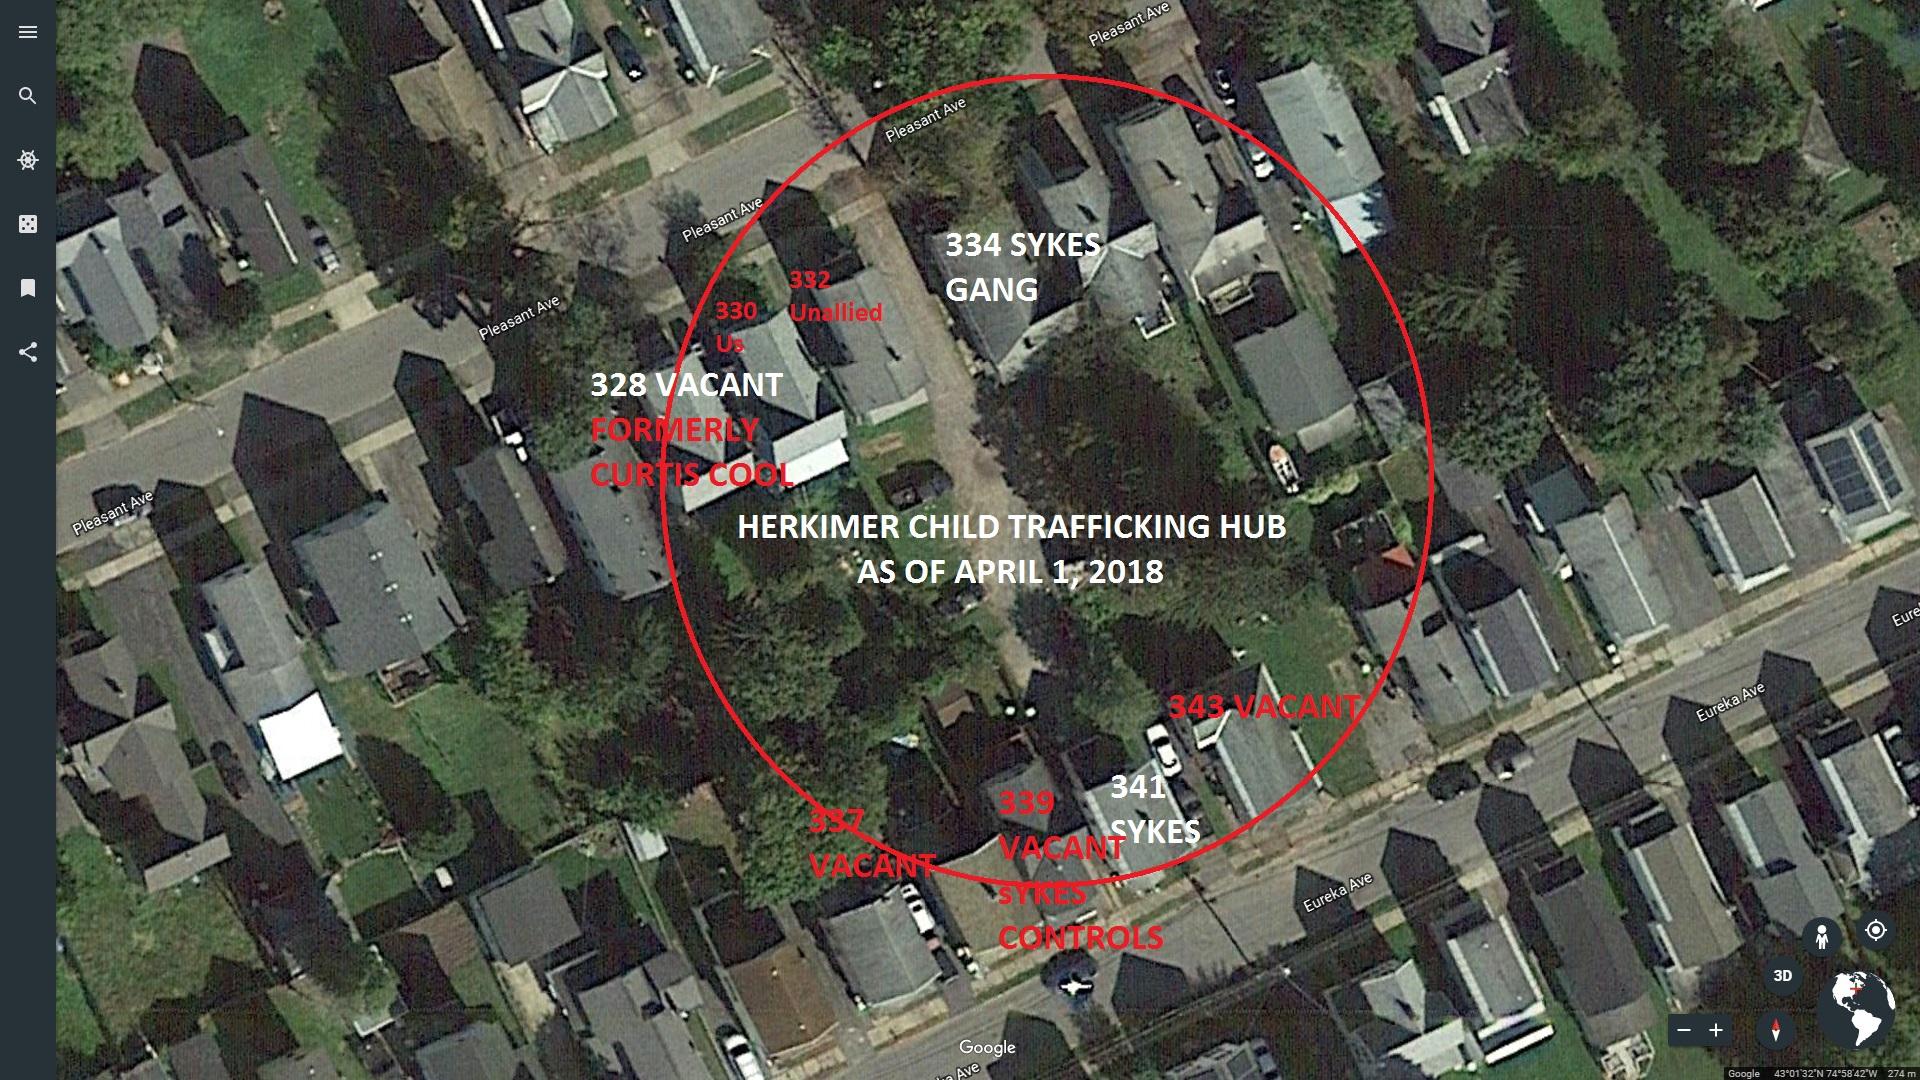 Herkimer child trafficking hub